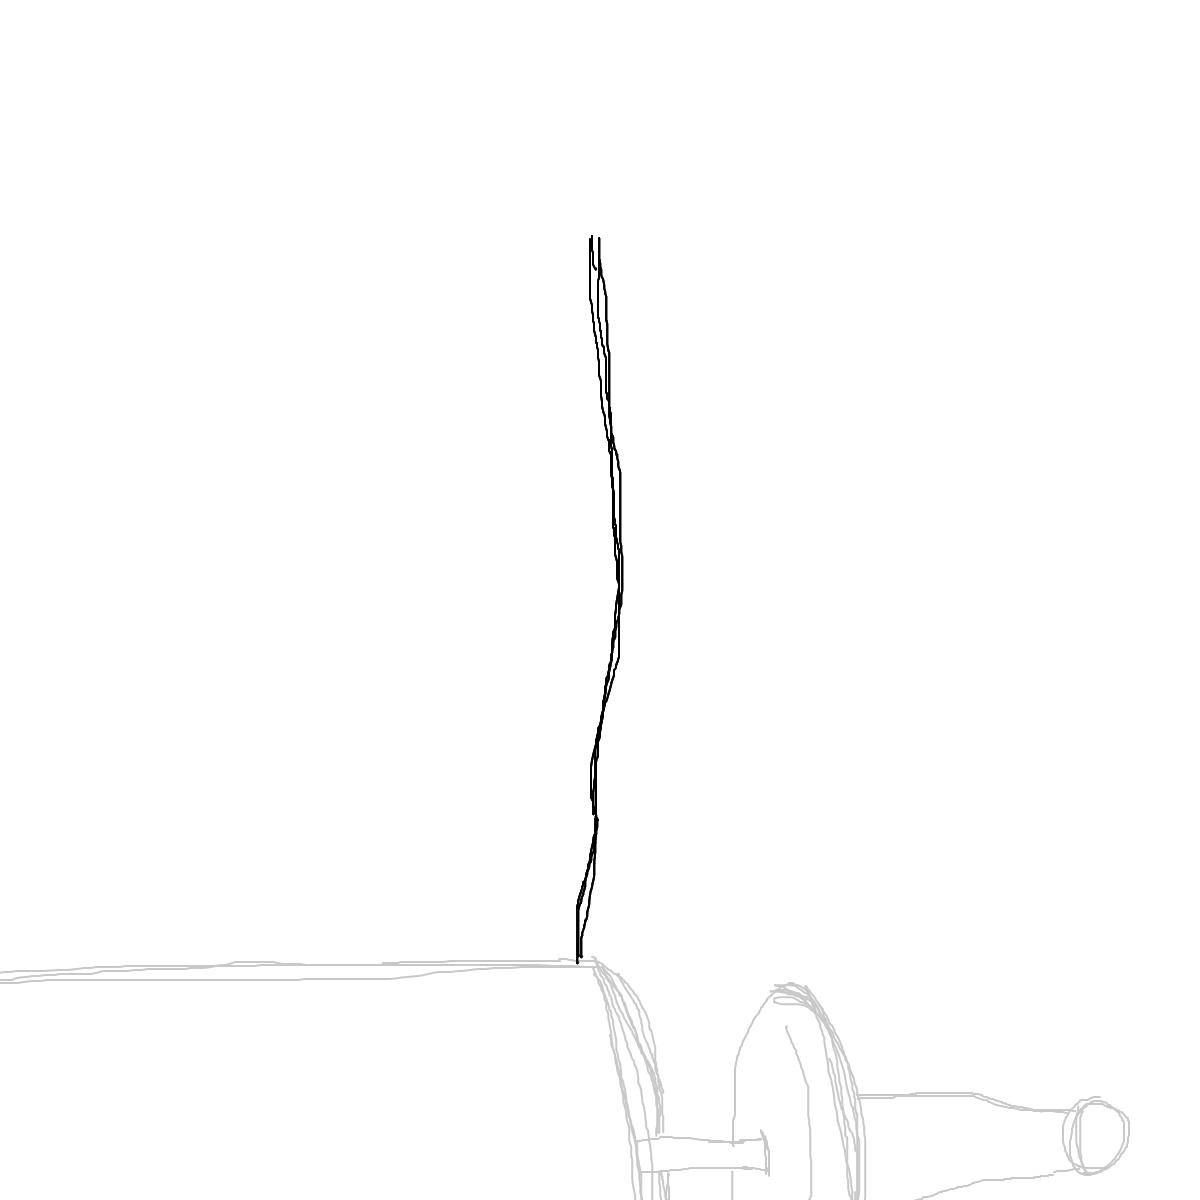 BAAAM drawing#10704 lat:51.0362892150878900lng: -114.0524291992187500